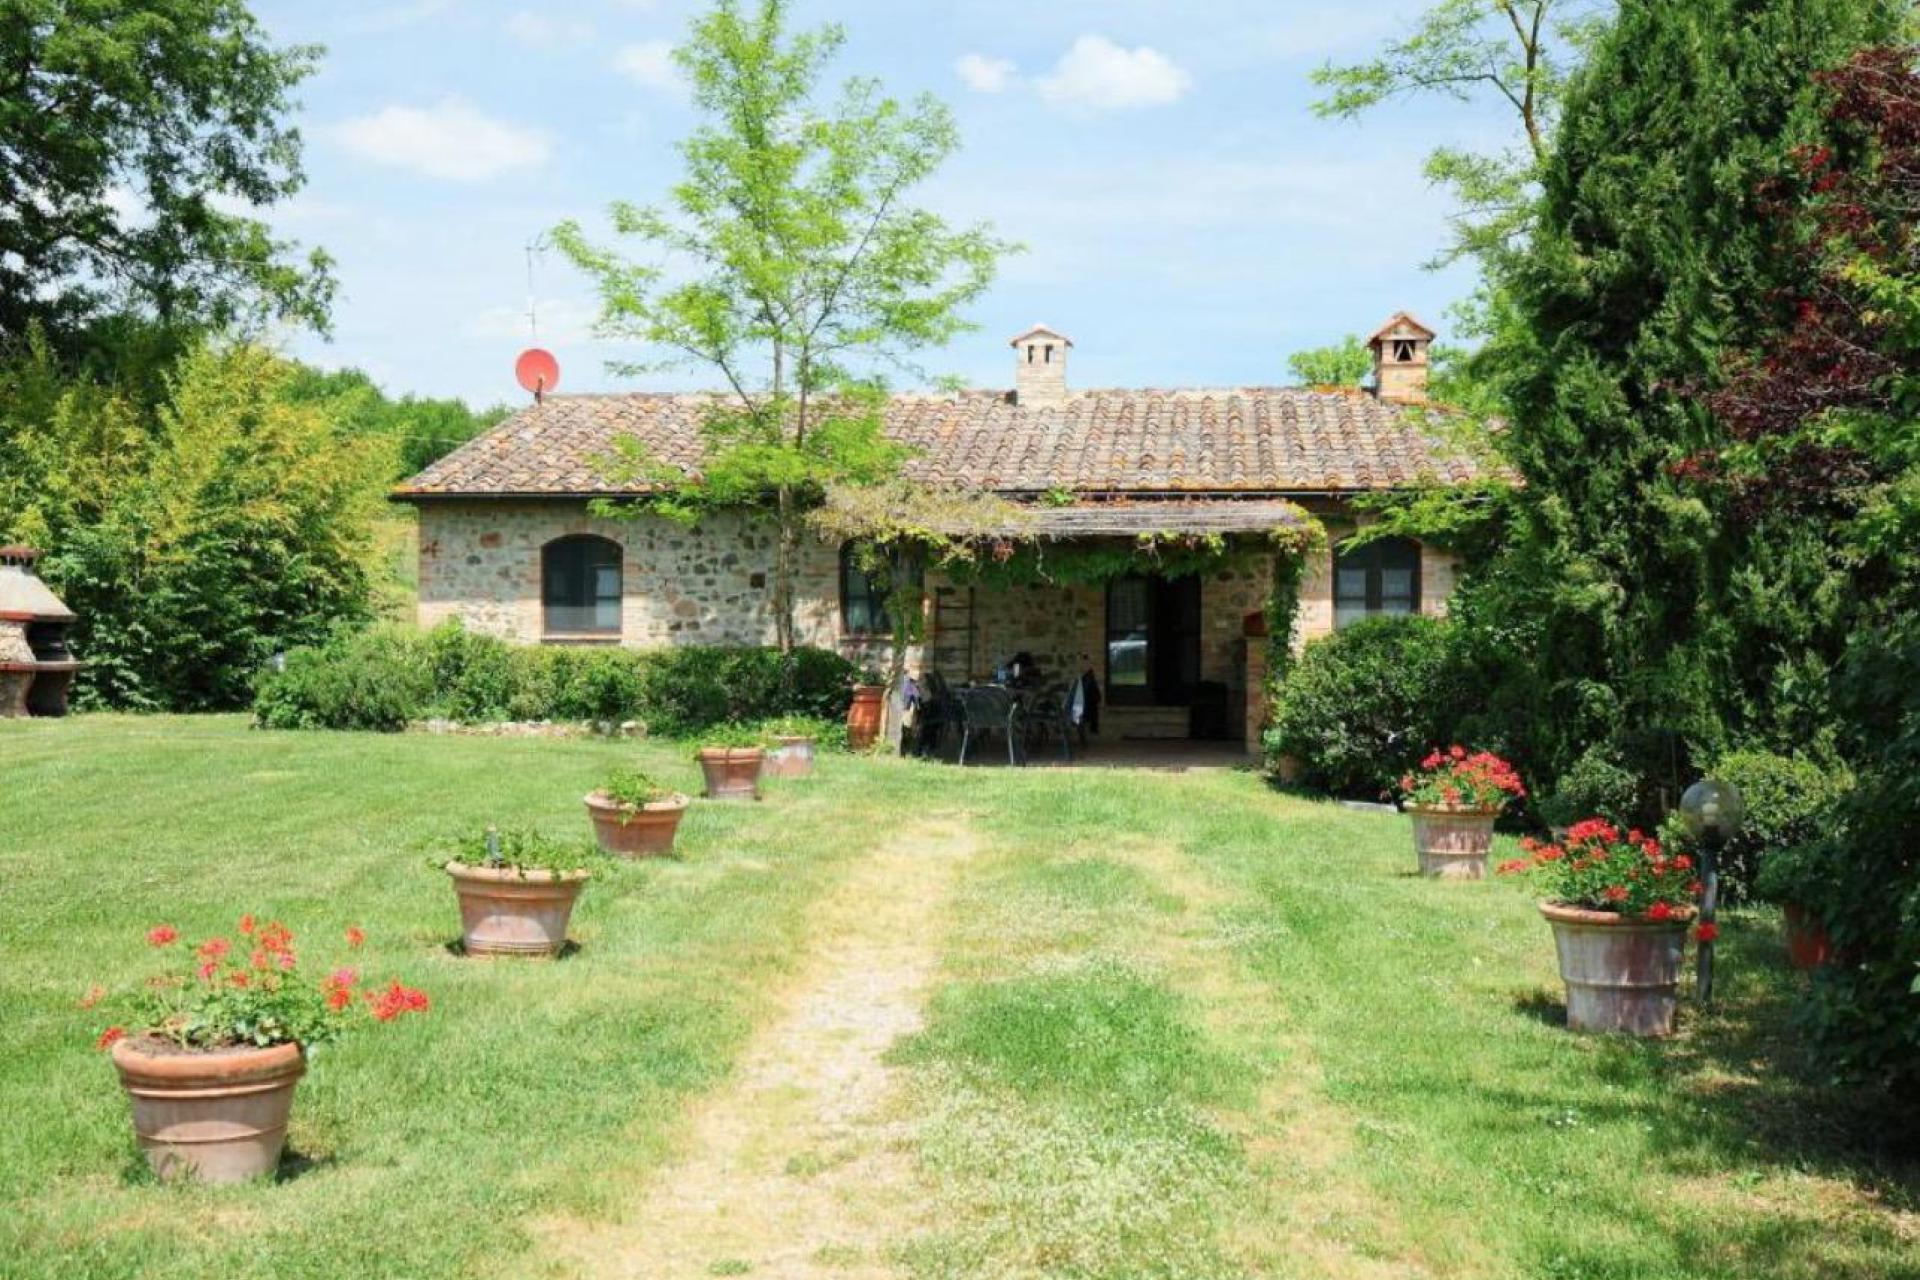 Agriturismo Toscane Twee landhuizen Toscane met privé-zwembad | myitaly.nl